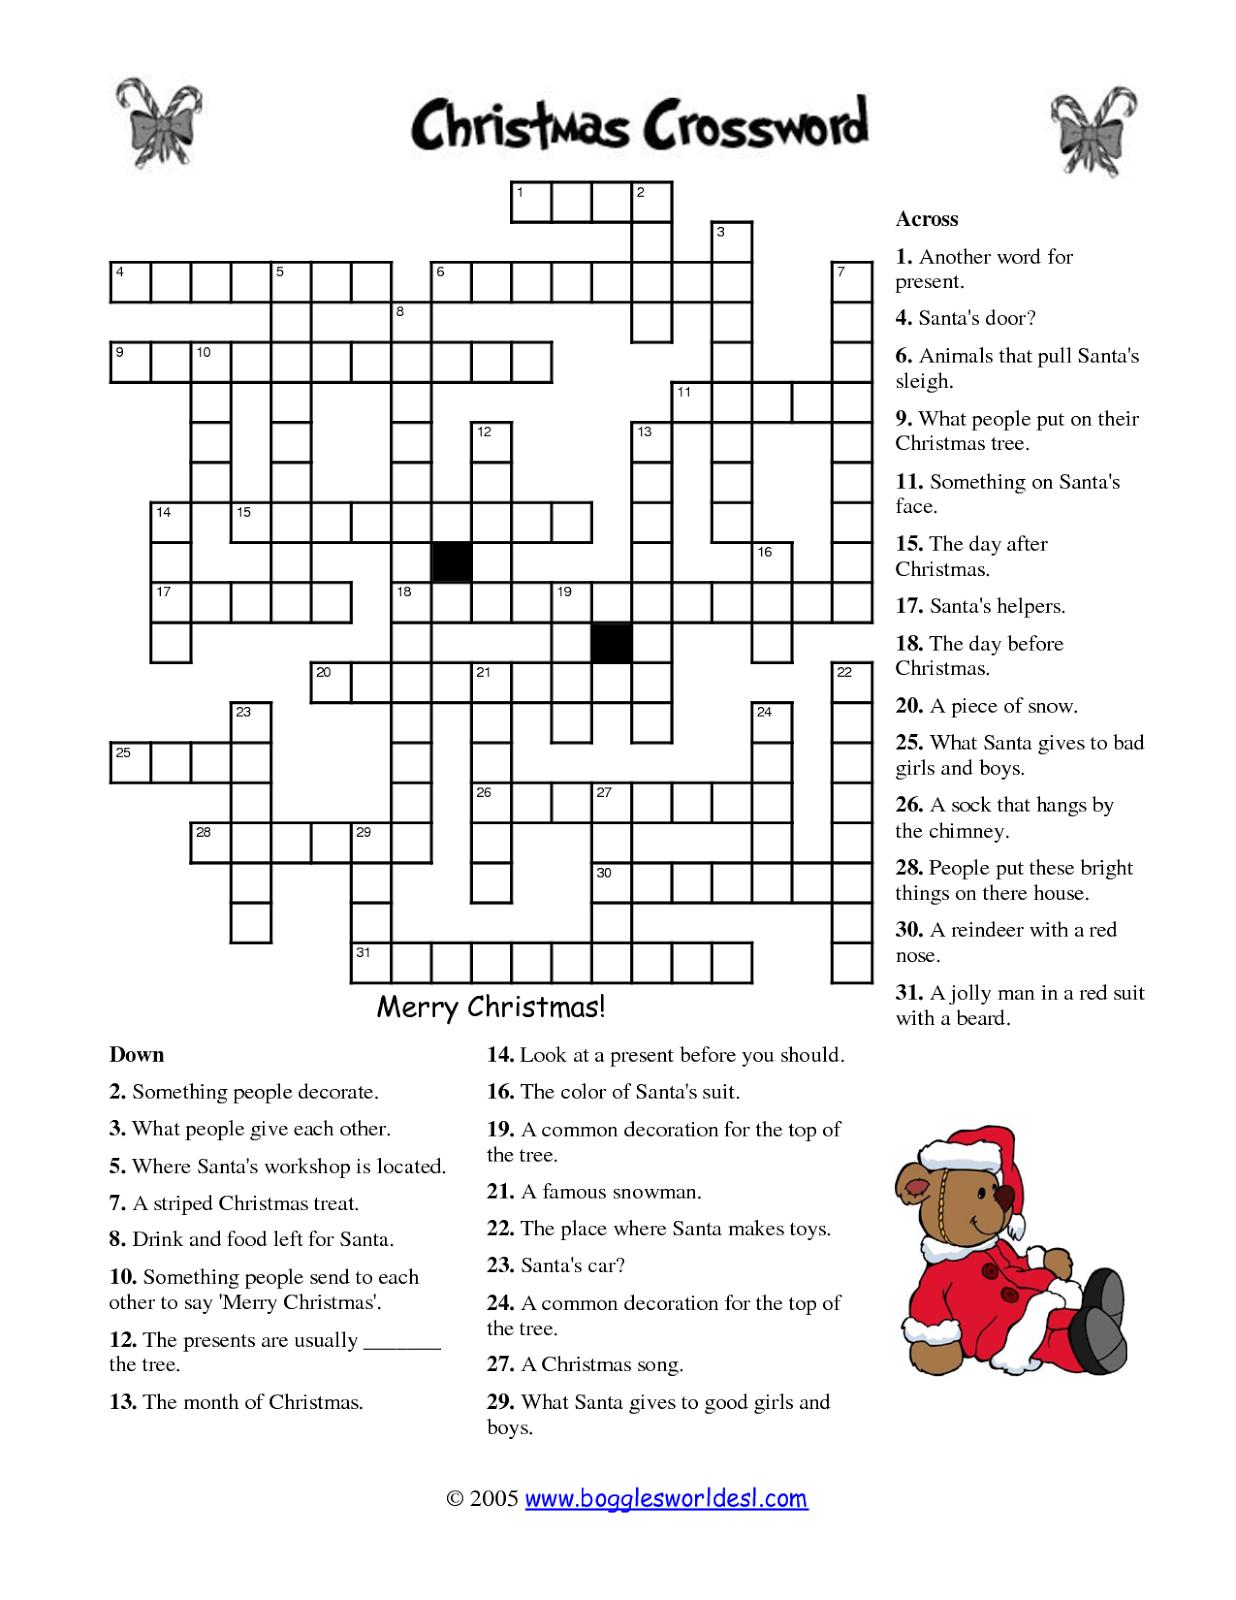 Free Printable Cards: Free Printable Crossword Puzzles | Printables - Printable Crosswords For 13 Year Olds